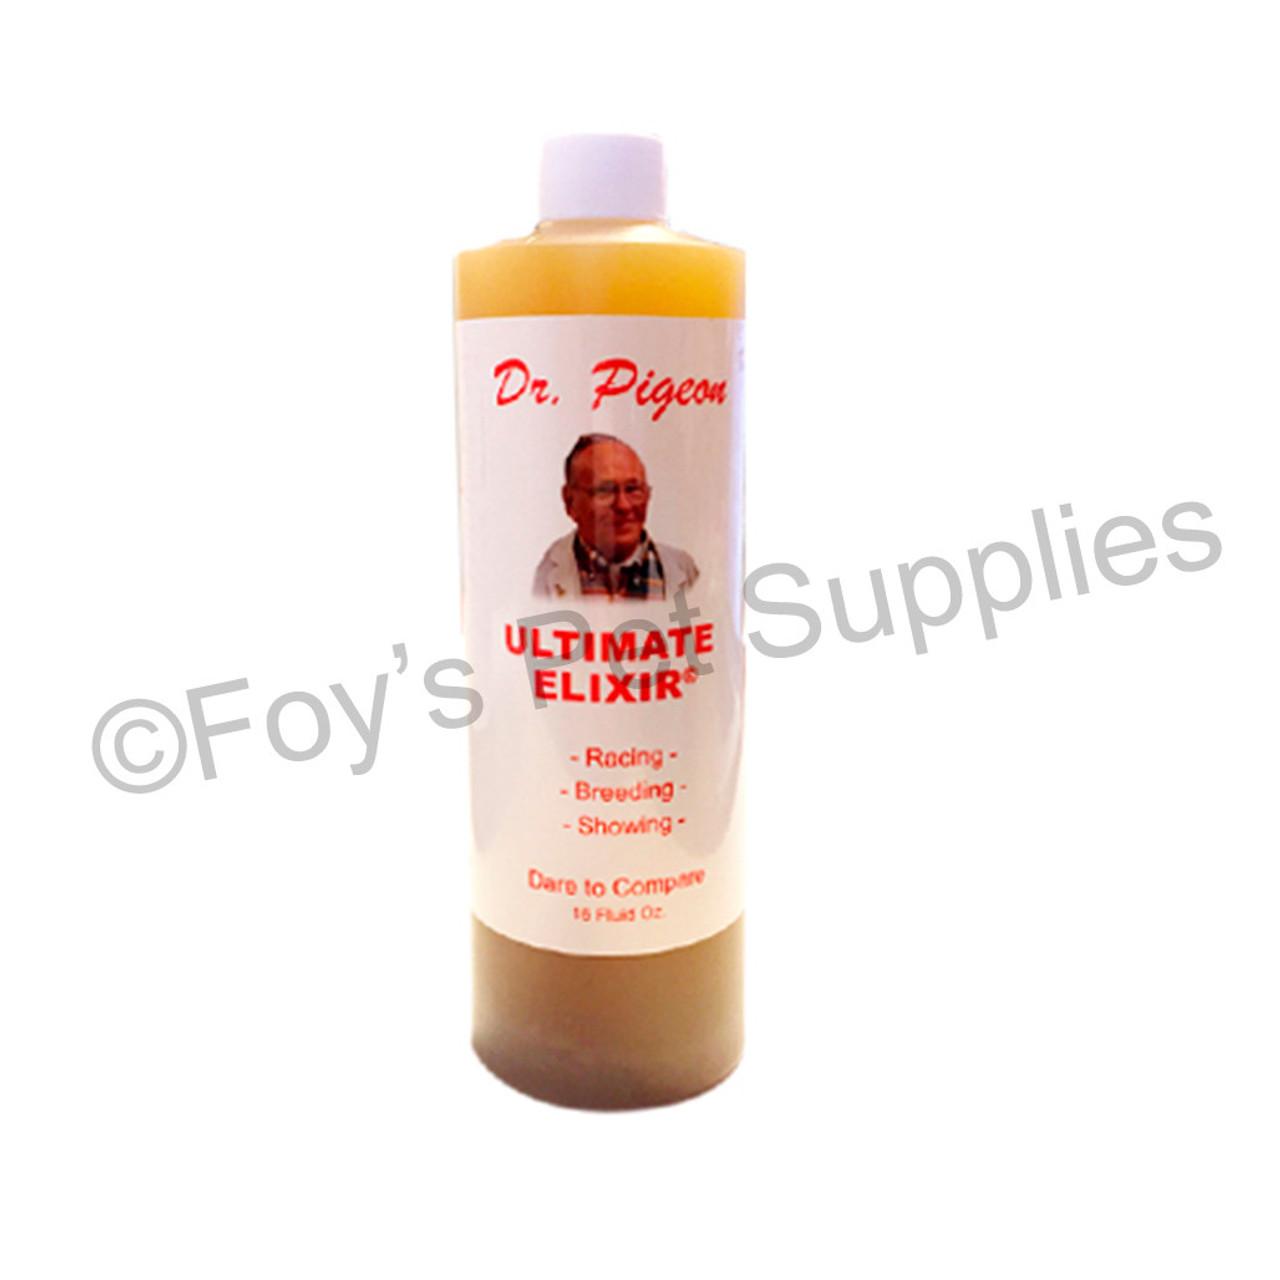 Dr. Pigeon's Ultimate Elixir - 16 oz.